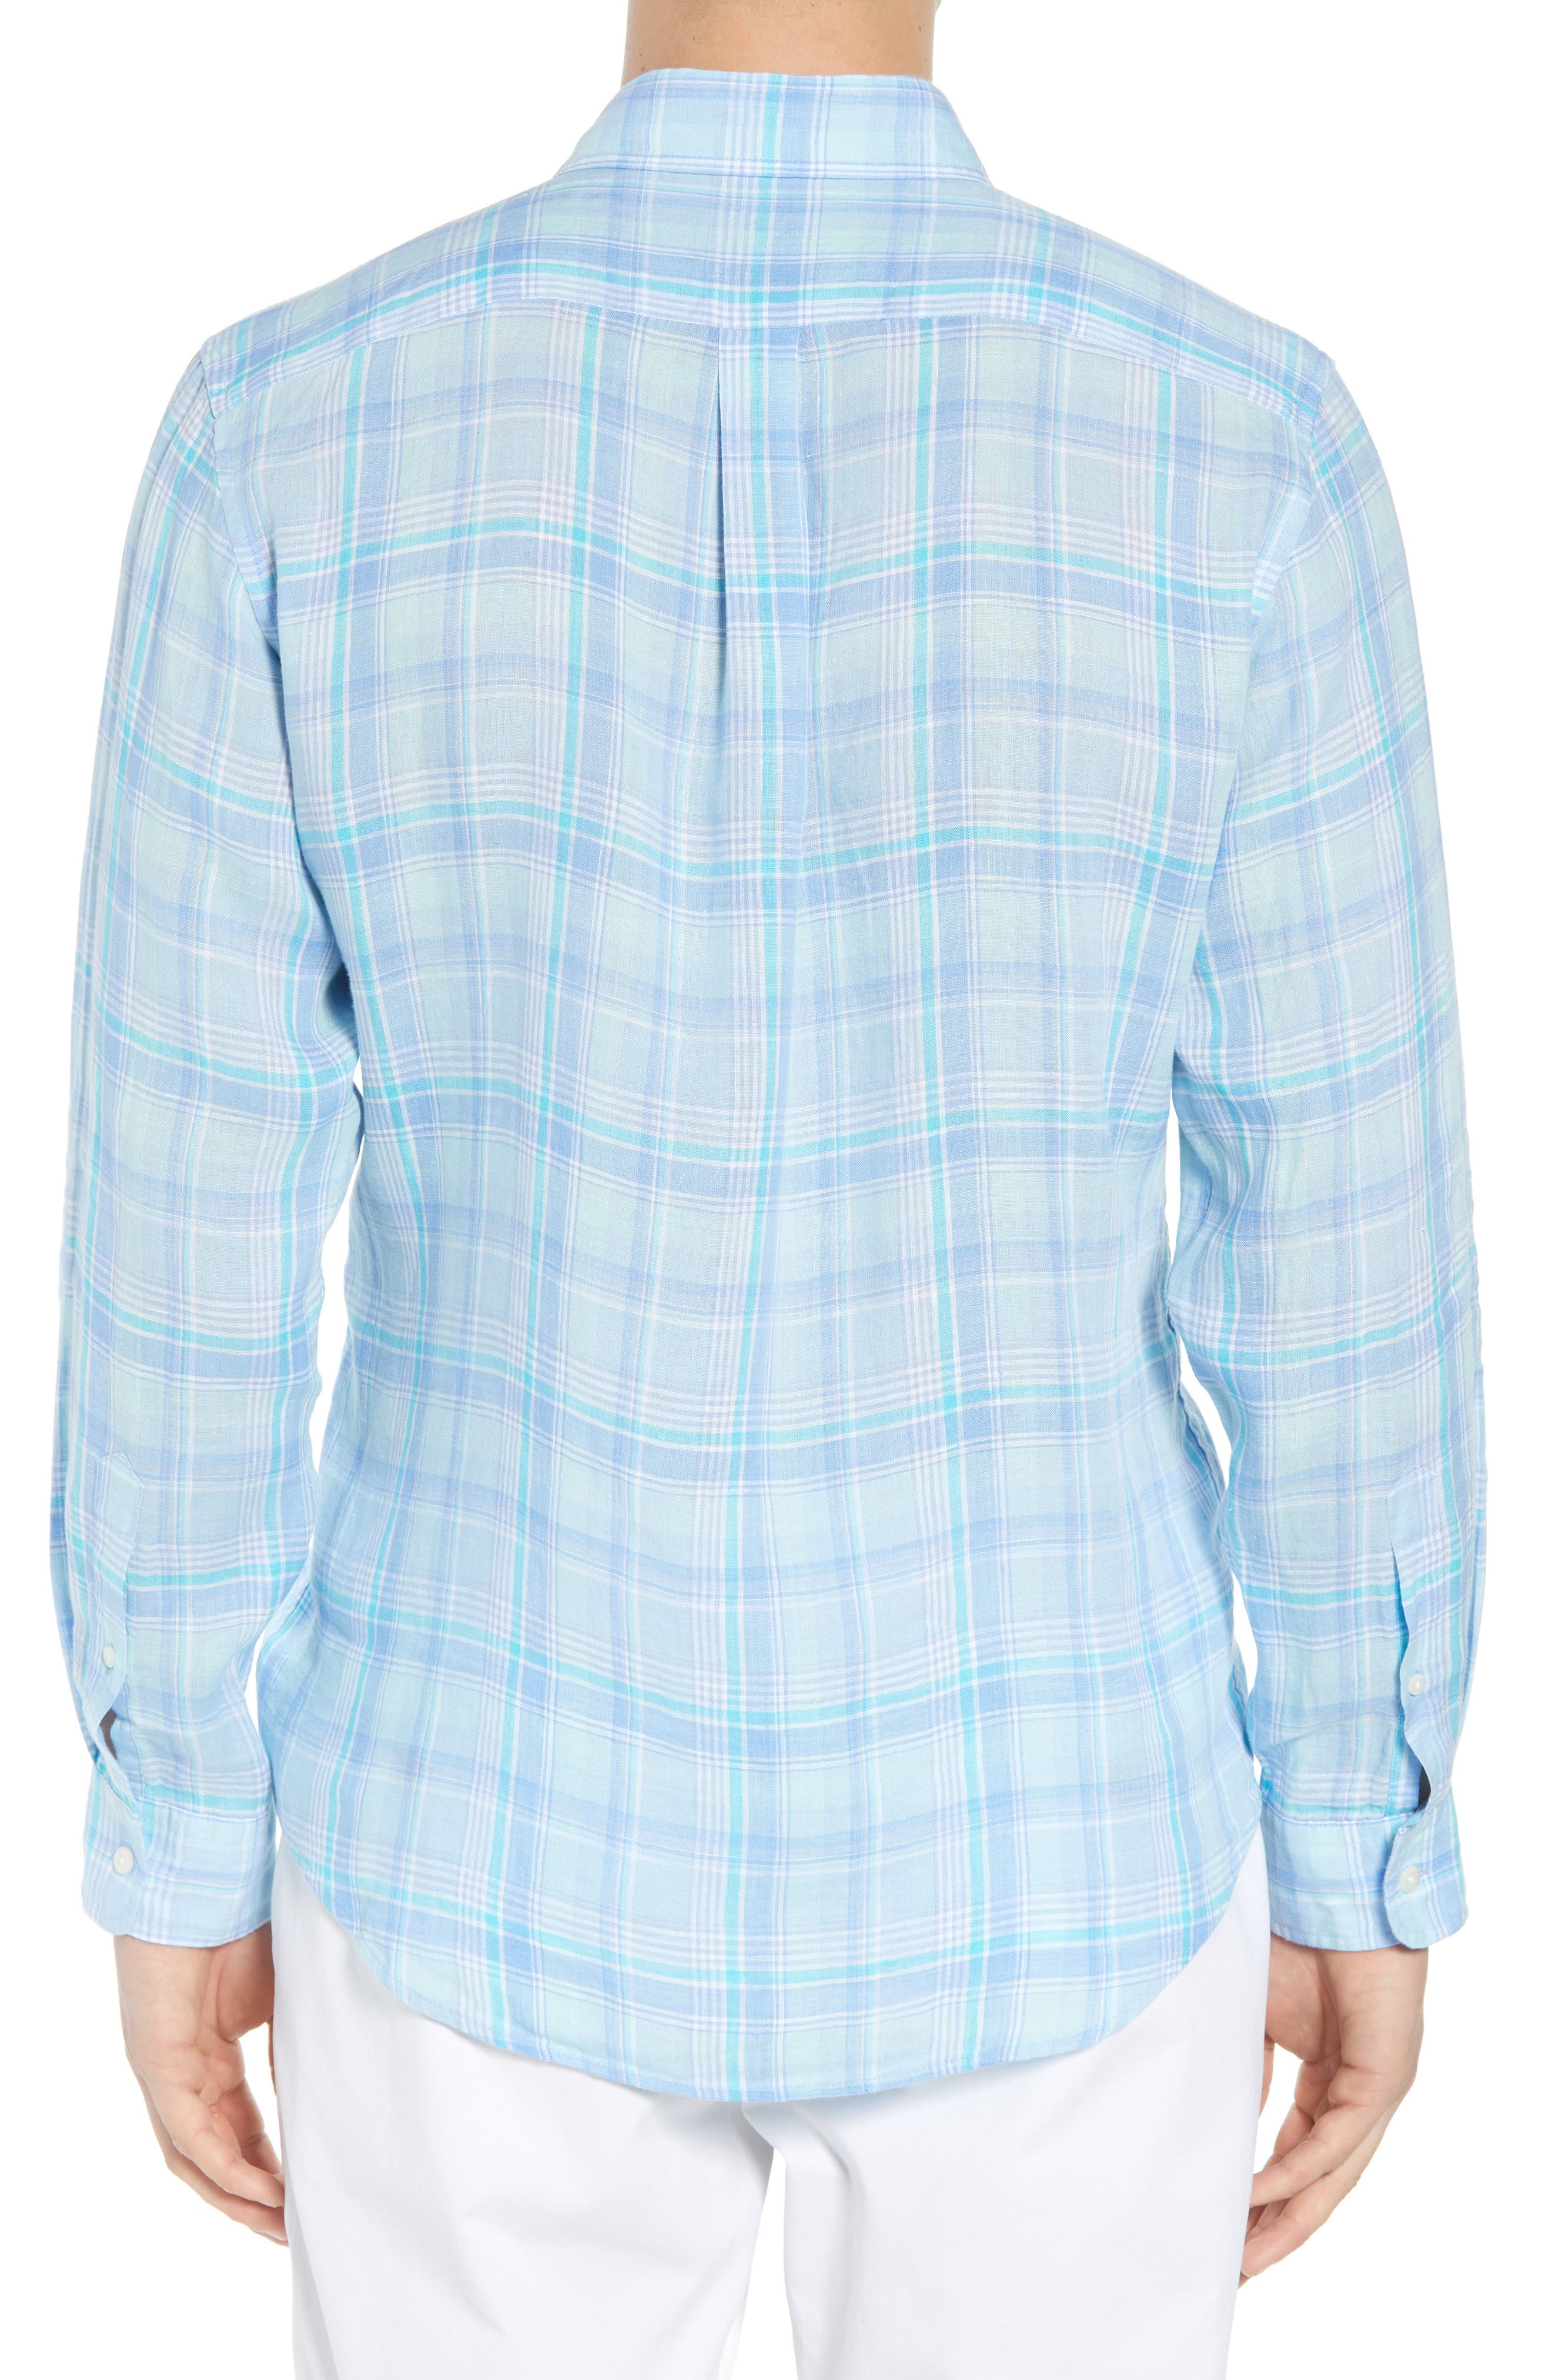 Moore's Island Classic Fit Plaid Sport Shirt,                             Alternate thumbnail 2, color,                             400